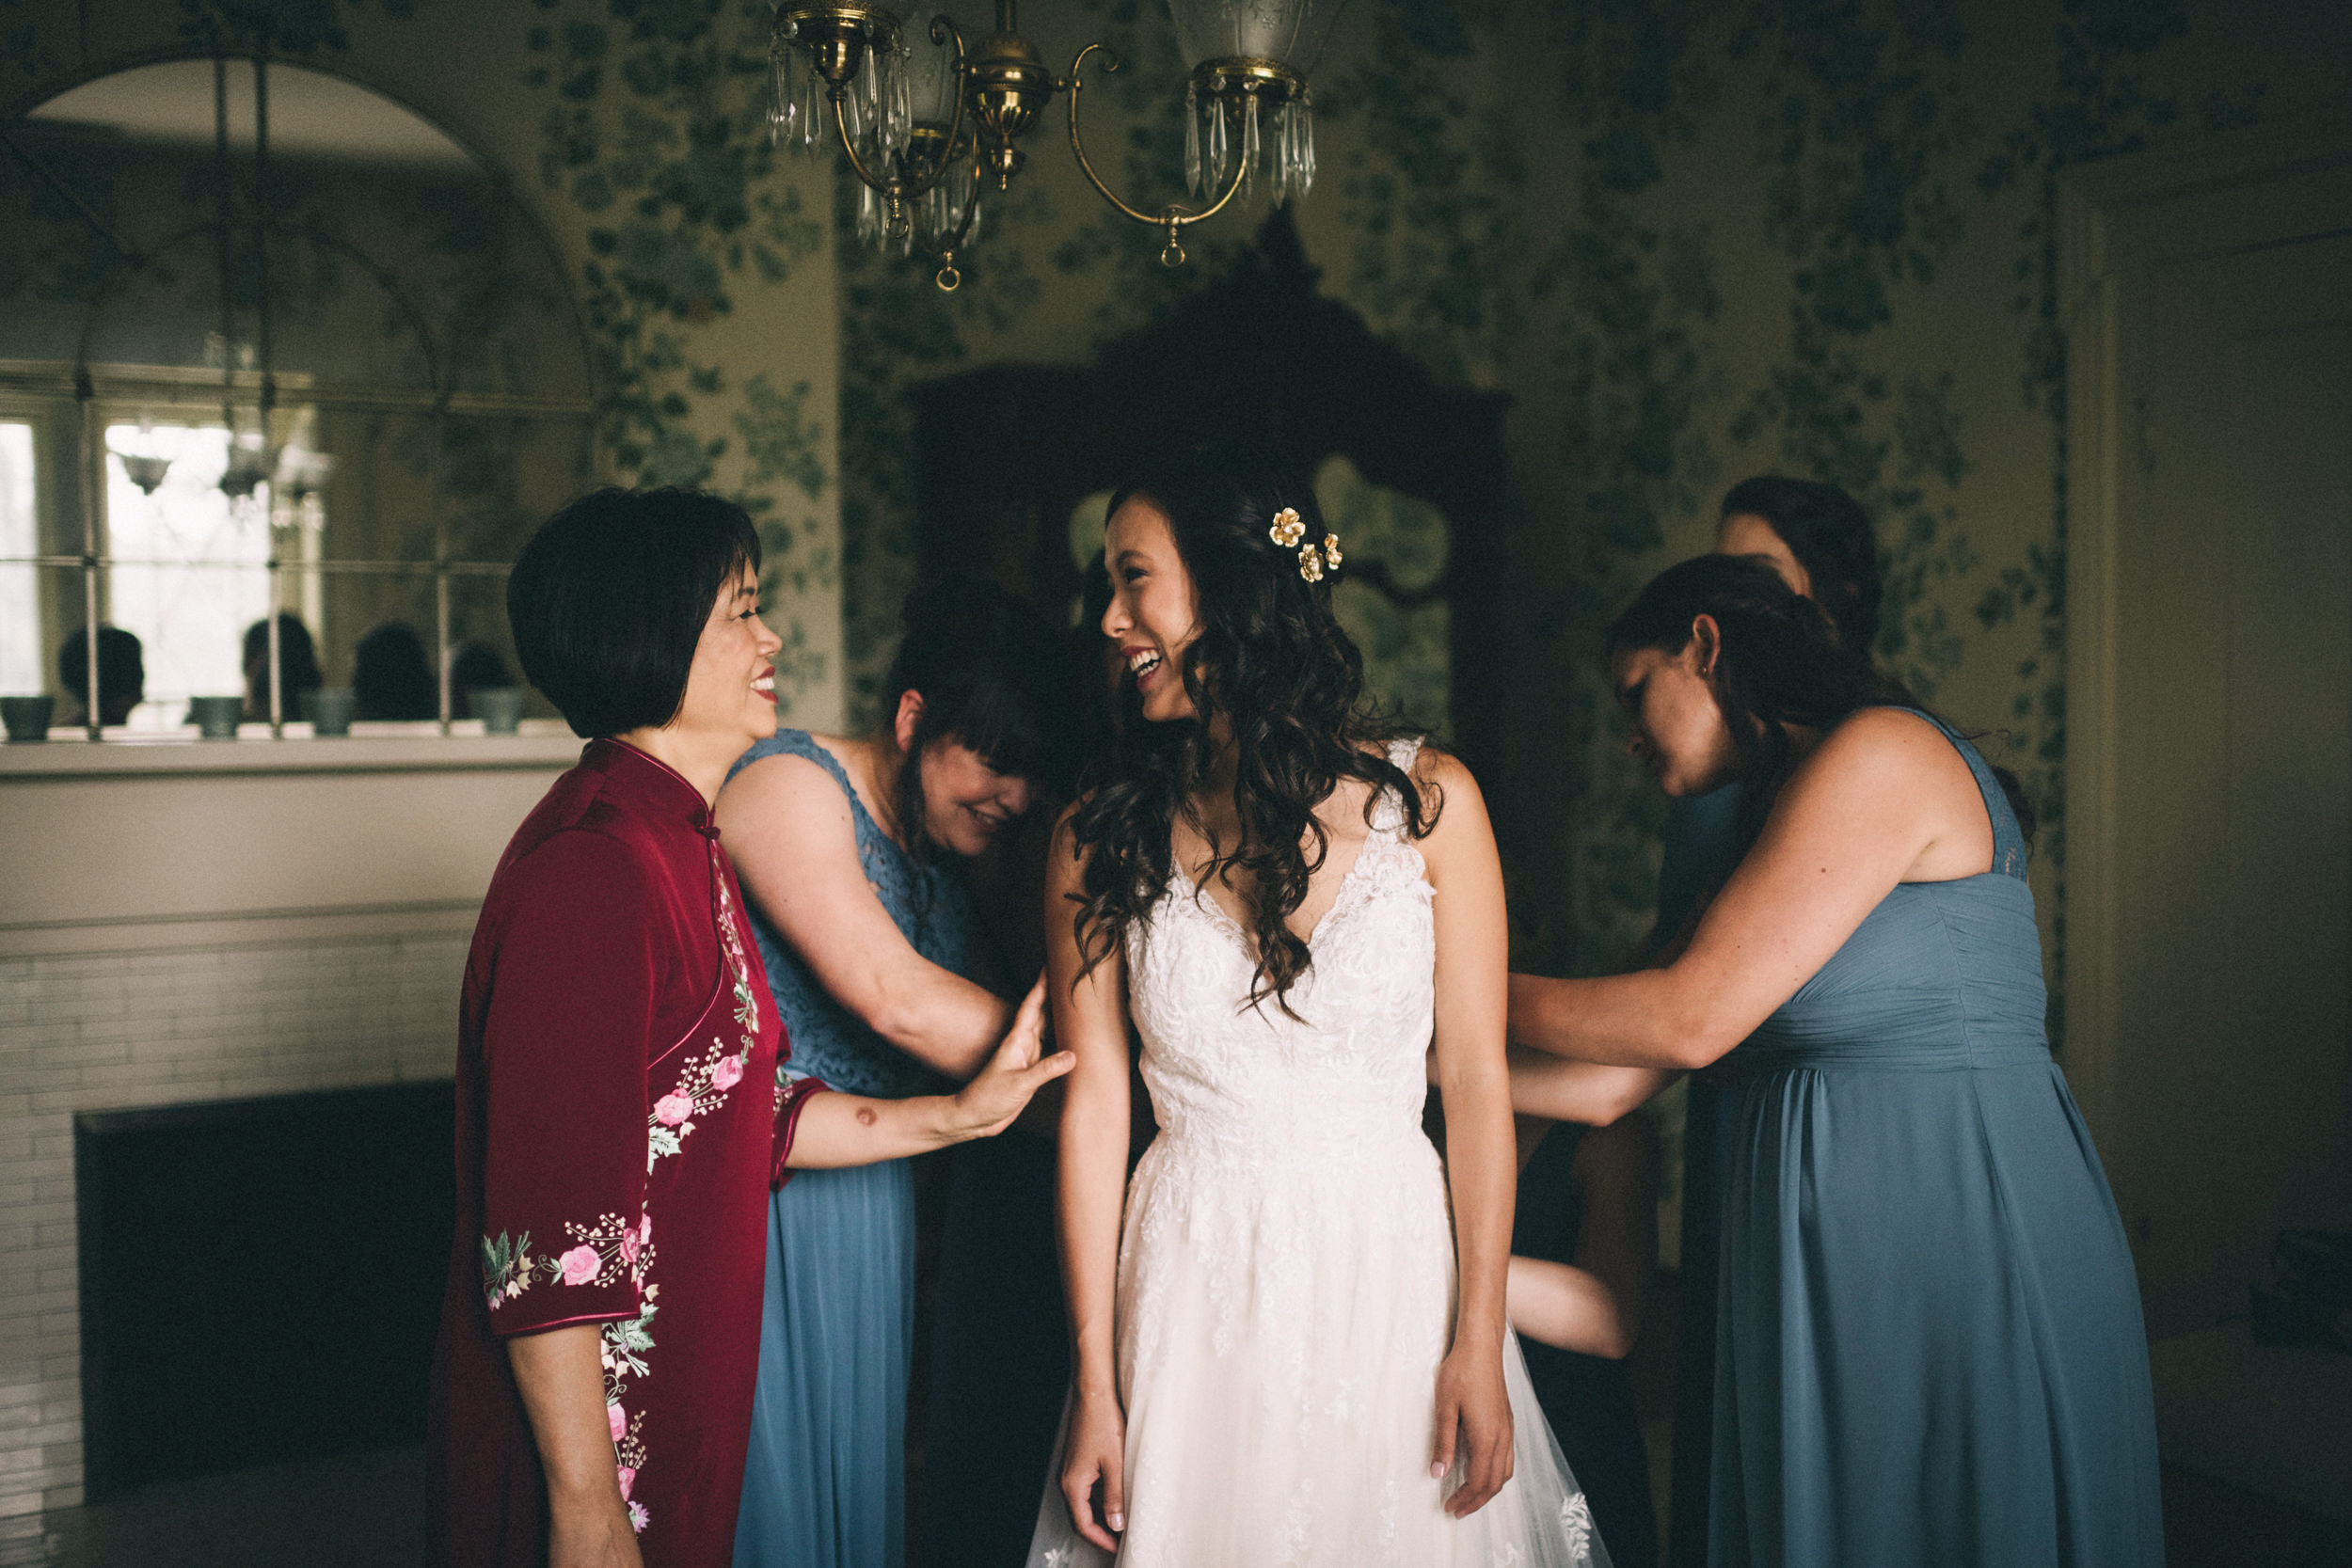 Louisville-Kentucky-Wedding-and-Elopement-Photographer-Sarah-Katherine-Davis-Photography-Summer-Jewel-Toned-Wedding-Chineese-Tea-Ceremony-Warrenwood-Manor-Danville-83.jpg